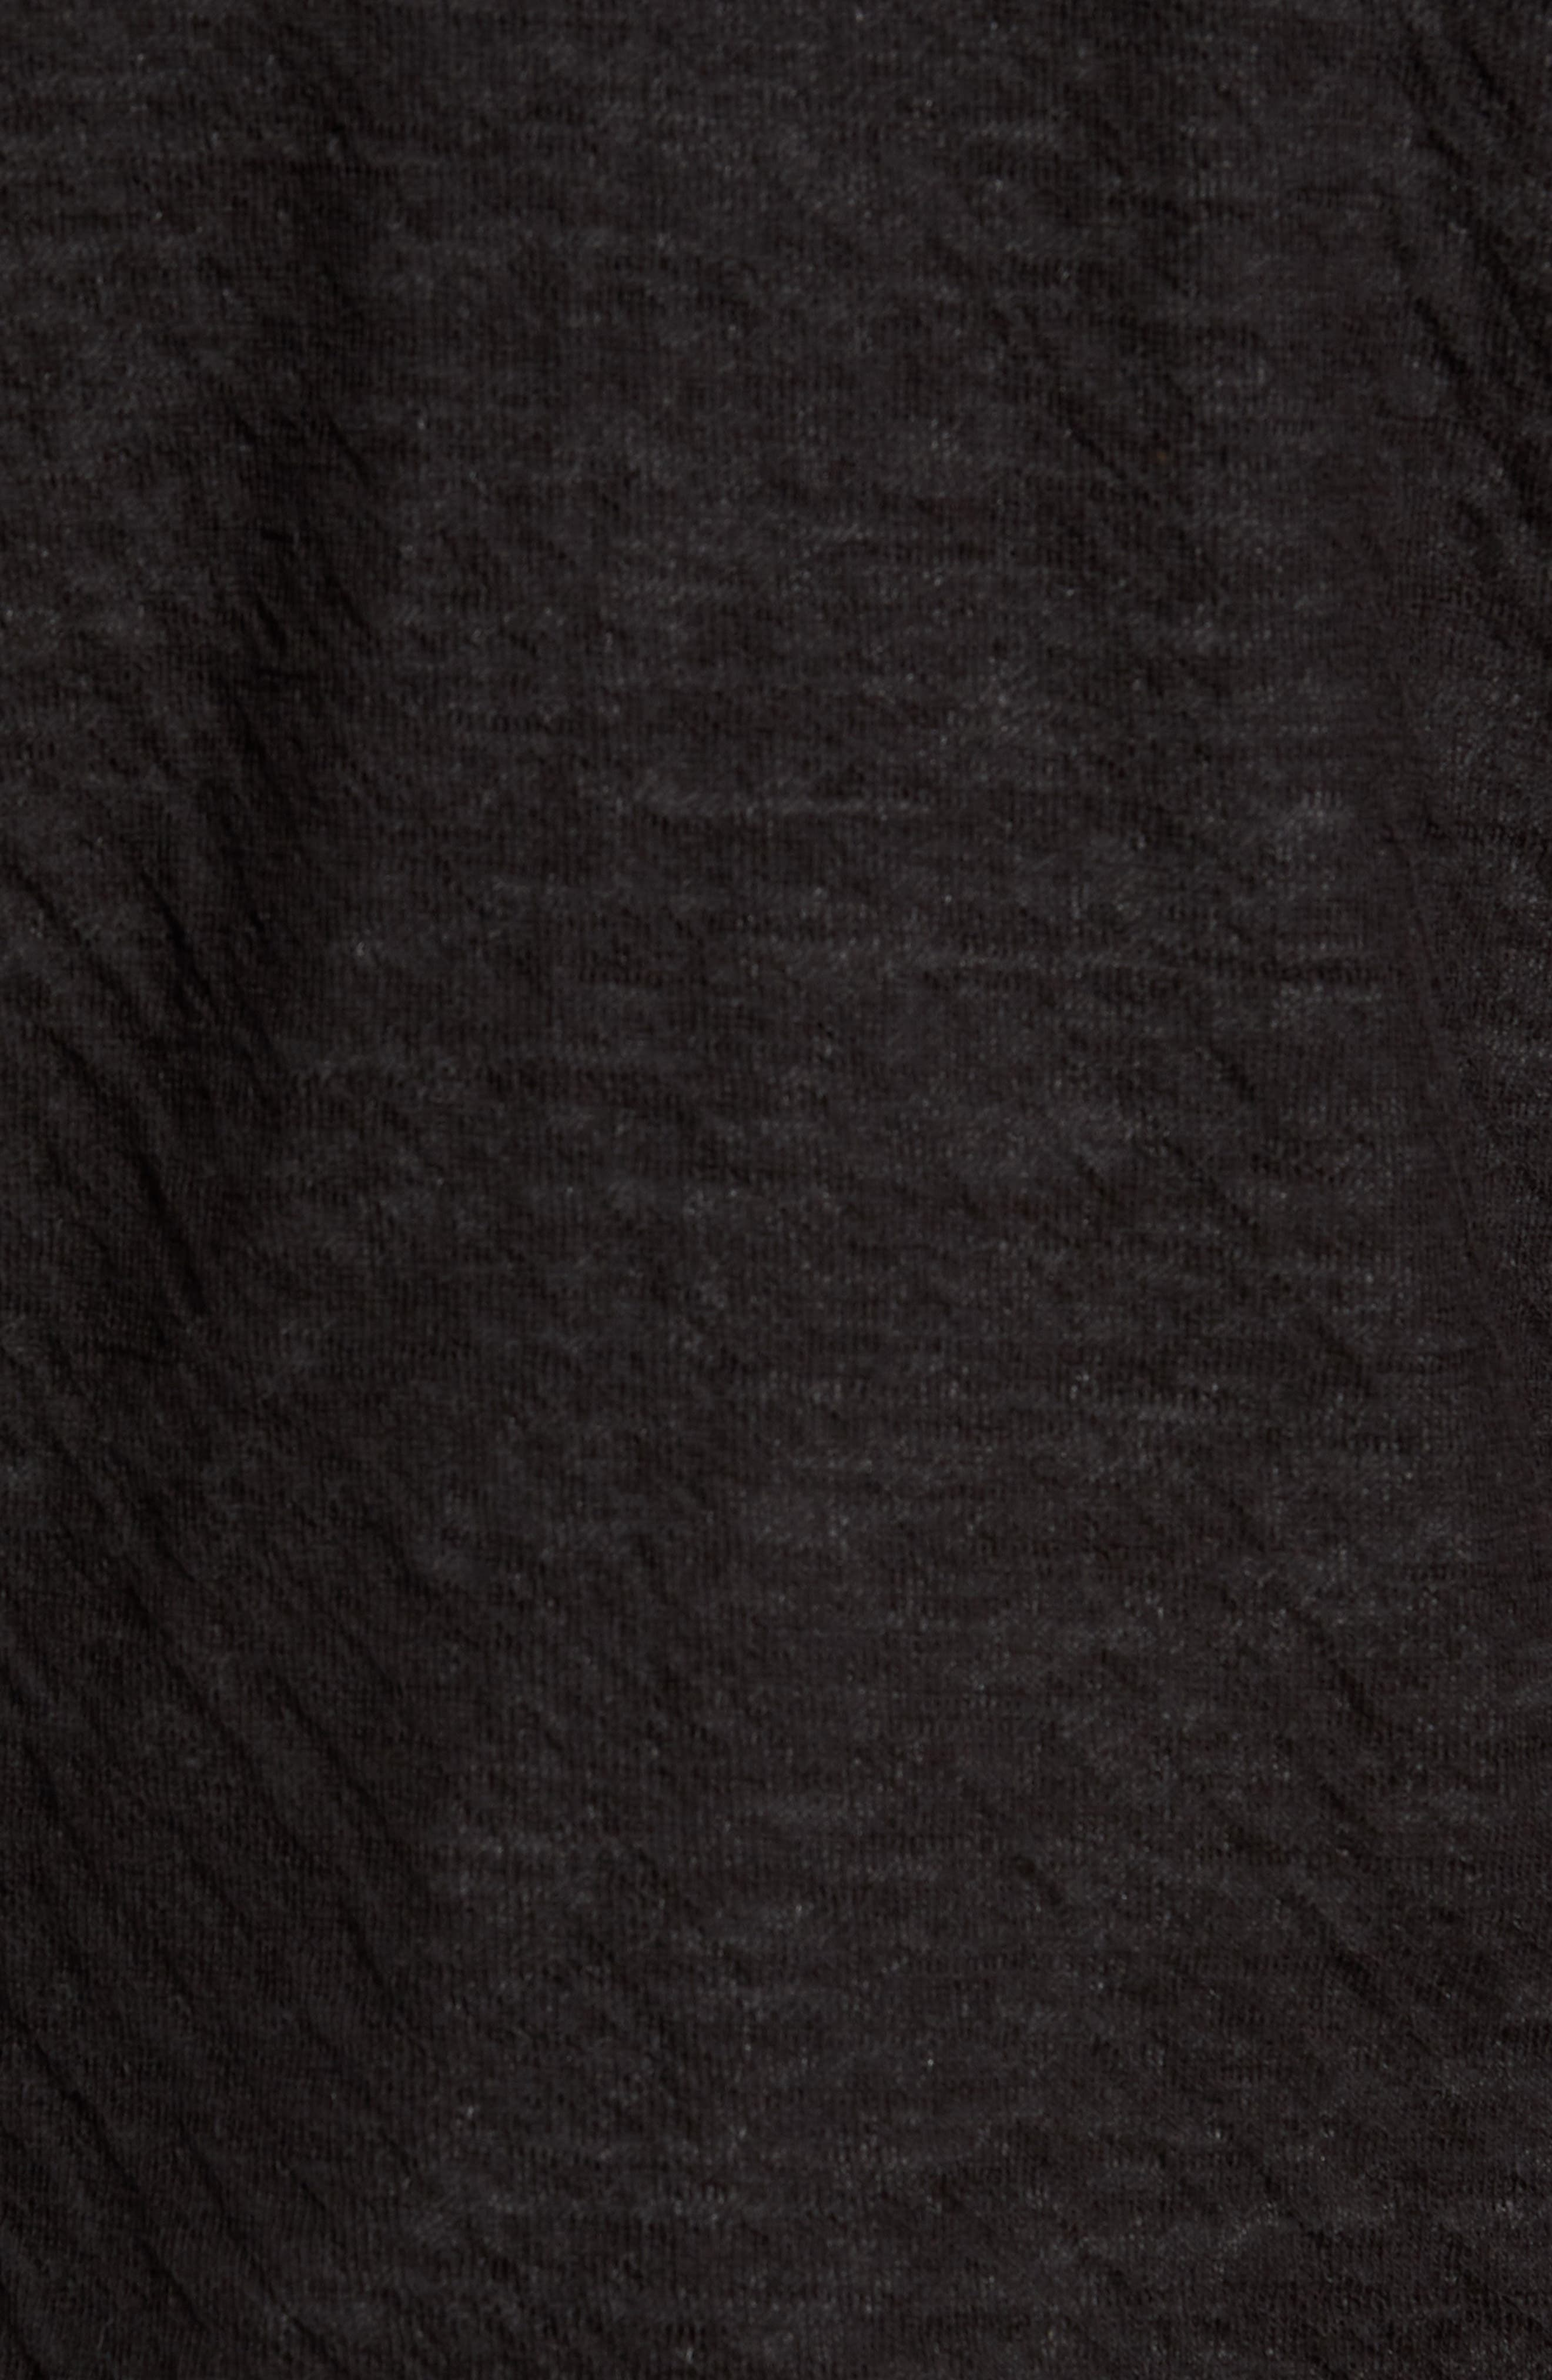 Contrast Double Knit Cotton & Wool Hoodie,                             Alternate thumbnail 5, color,                             Black/ H Carbon